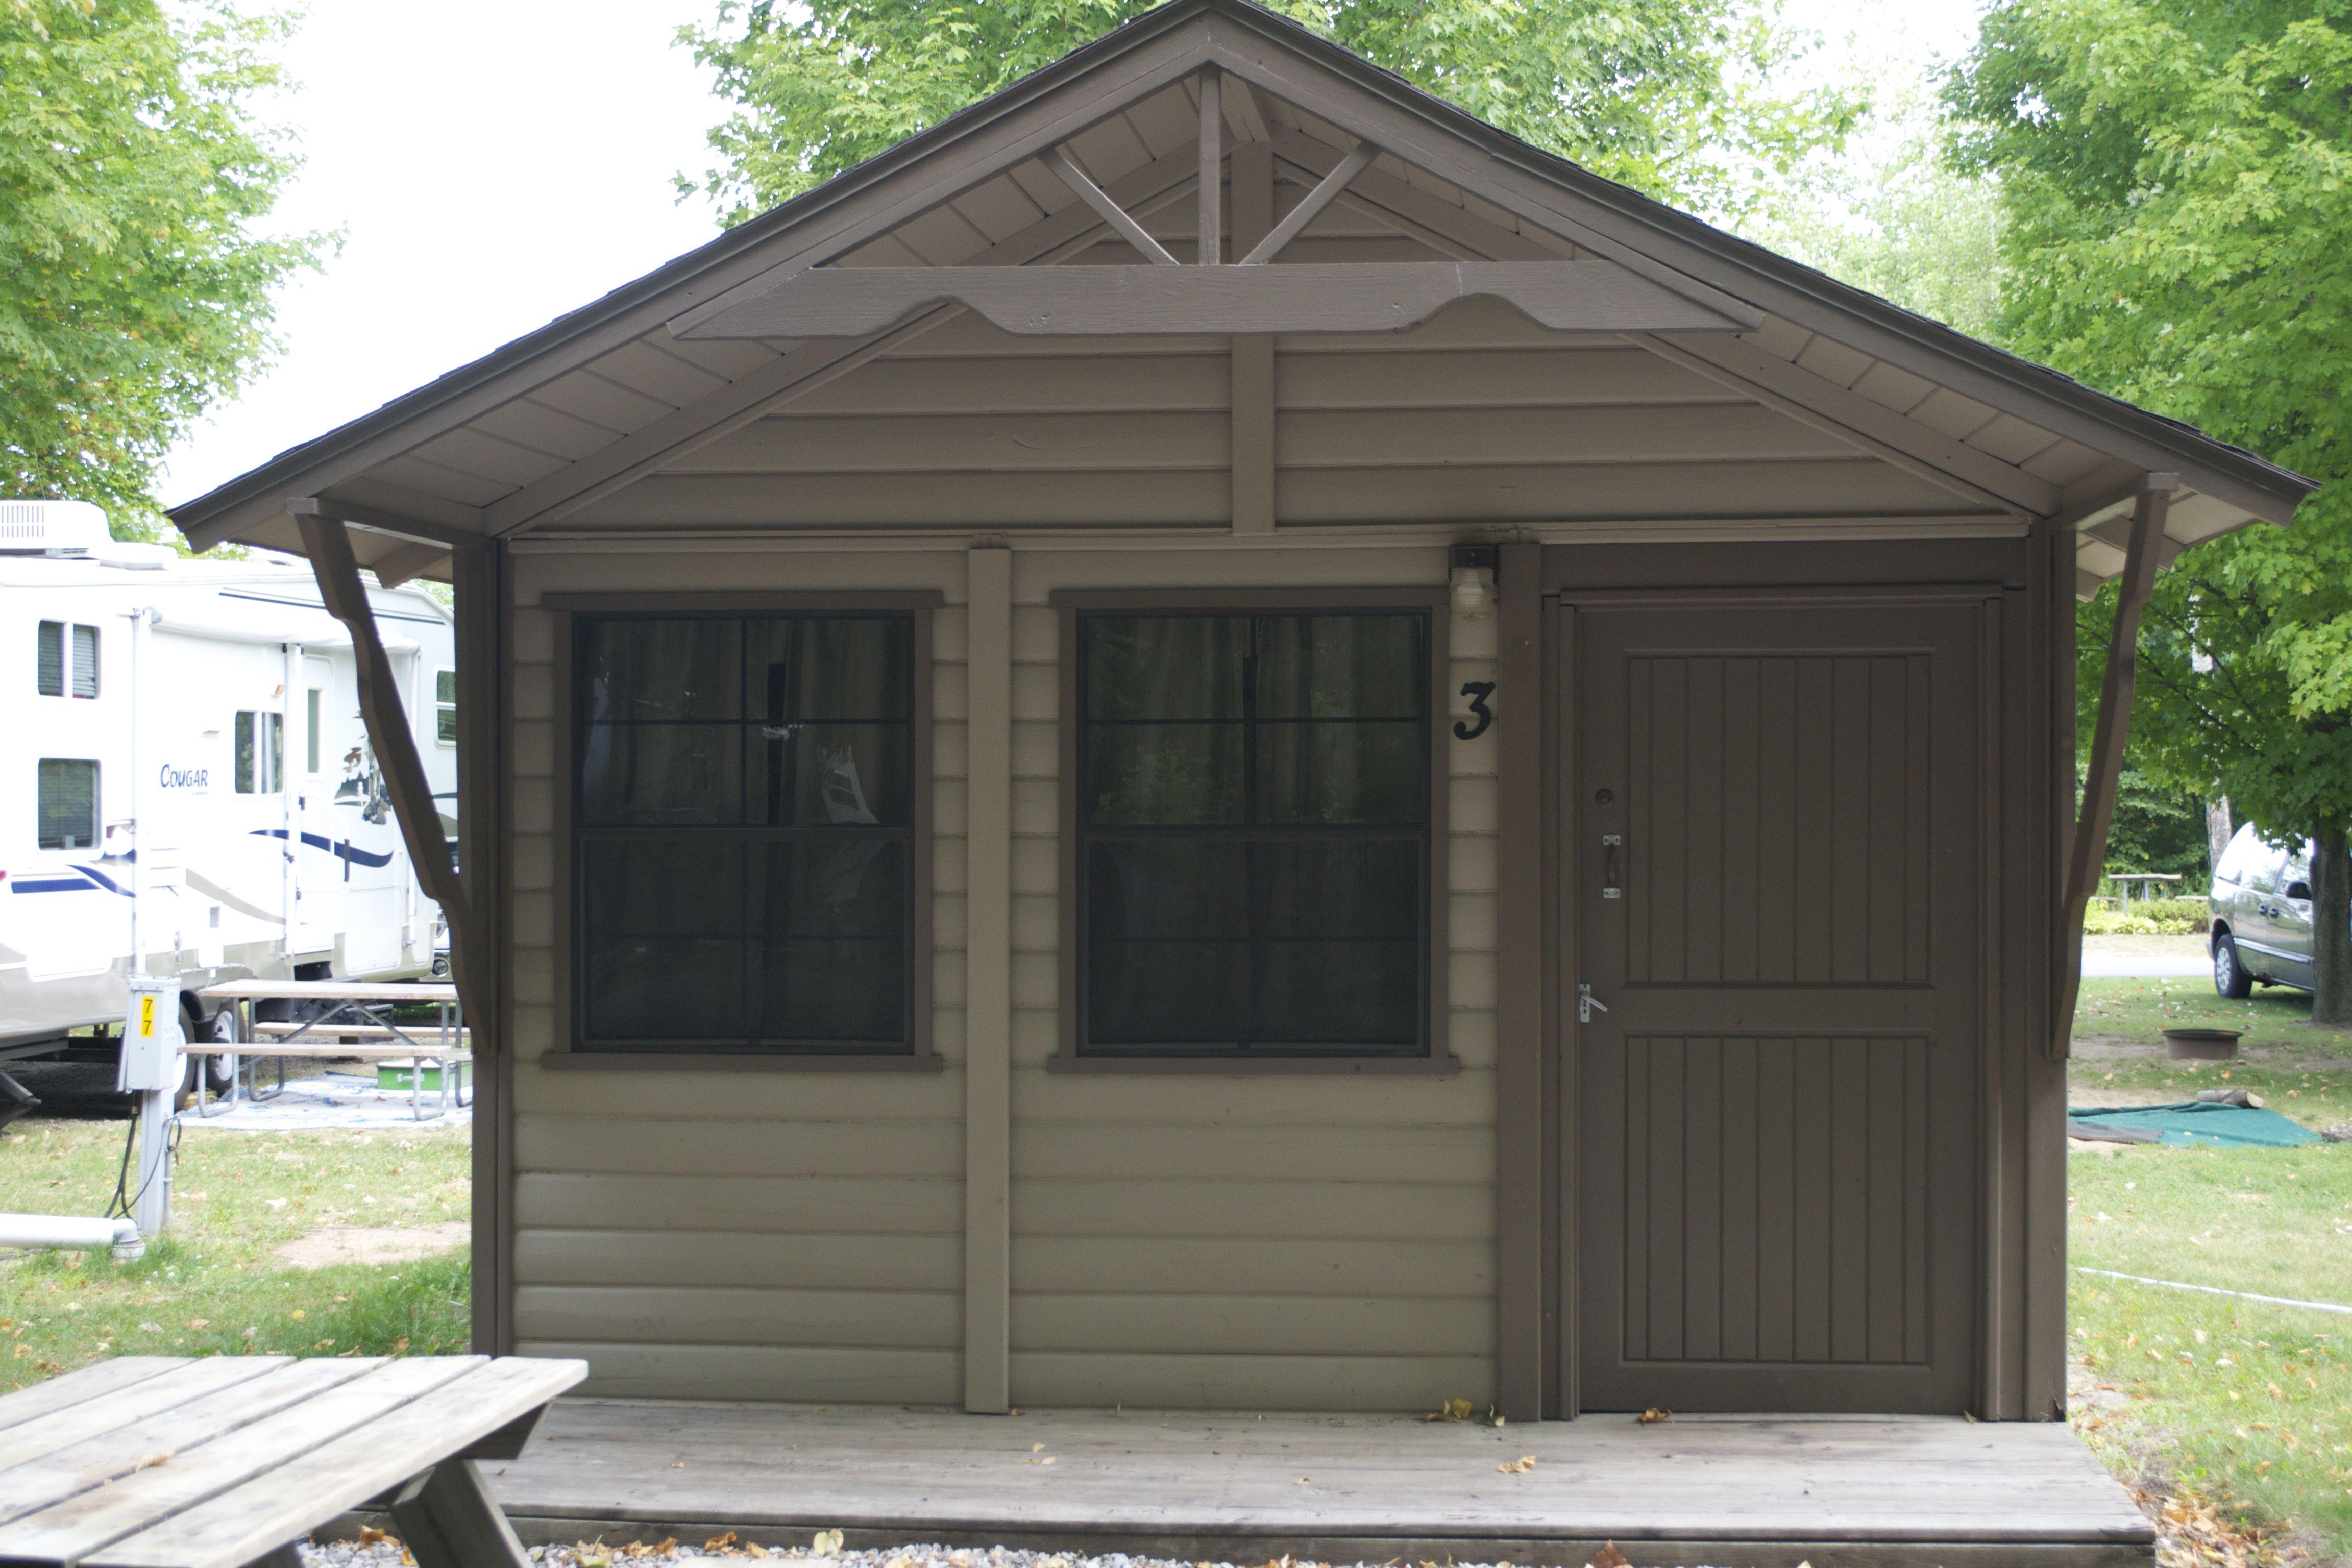 city ar cottages oabjlhwkivaf unfair area article in cottage is traverse term for rent say short rental ban owners